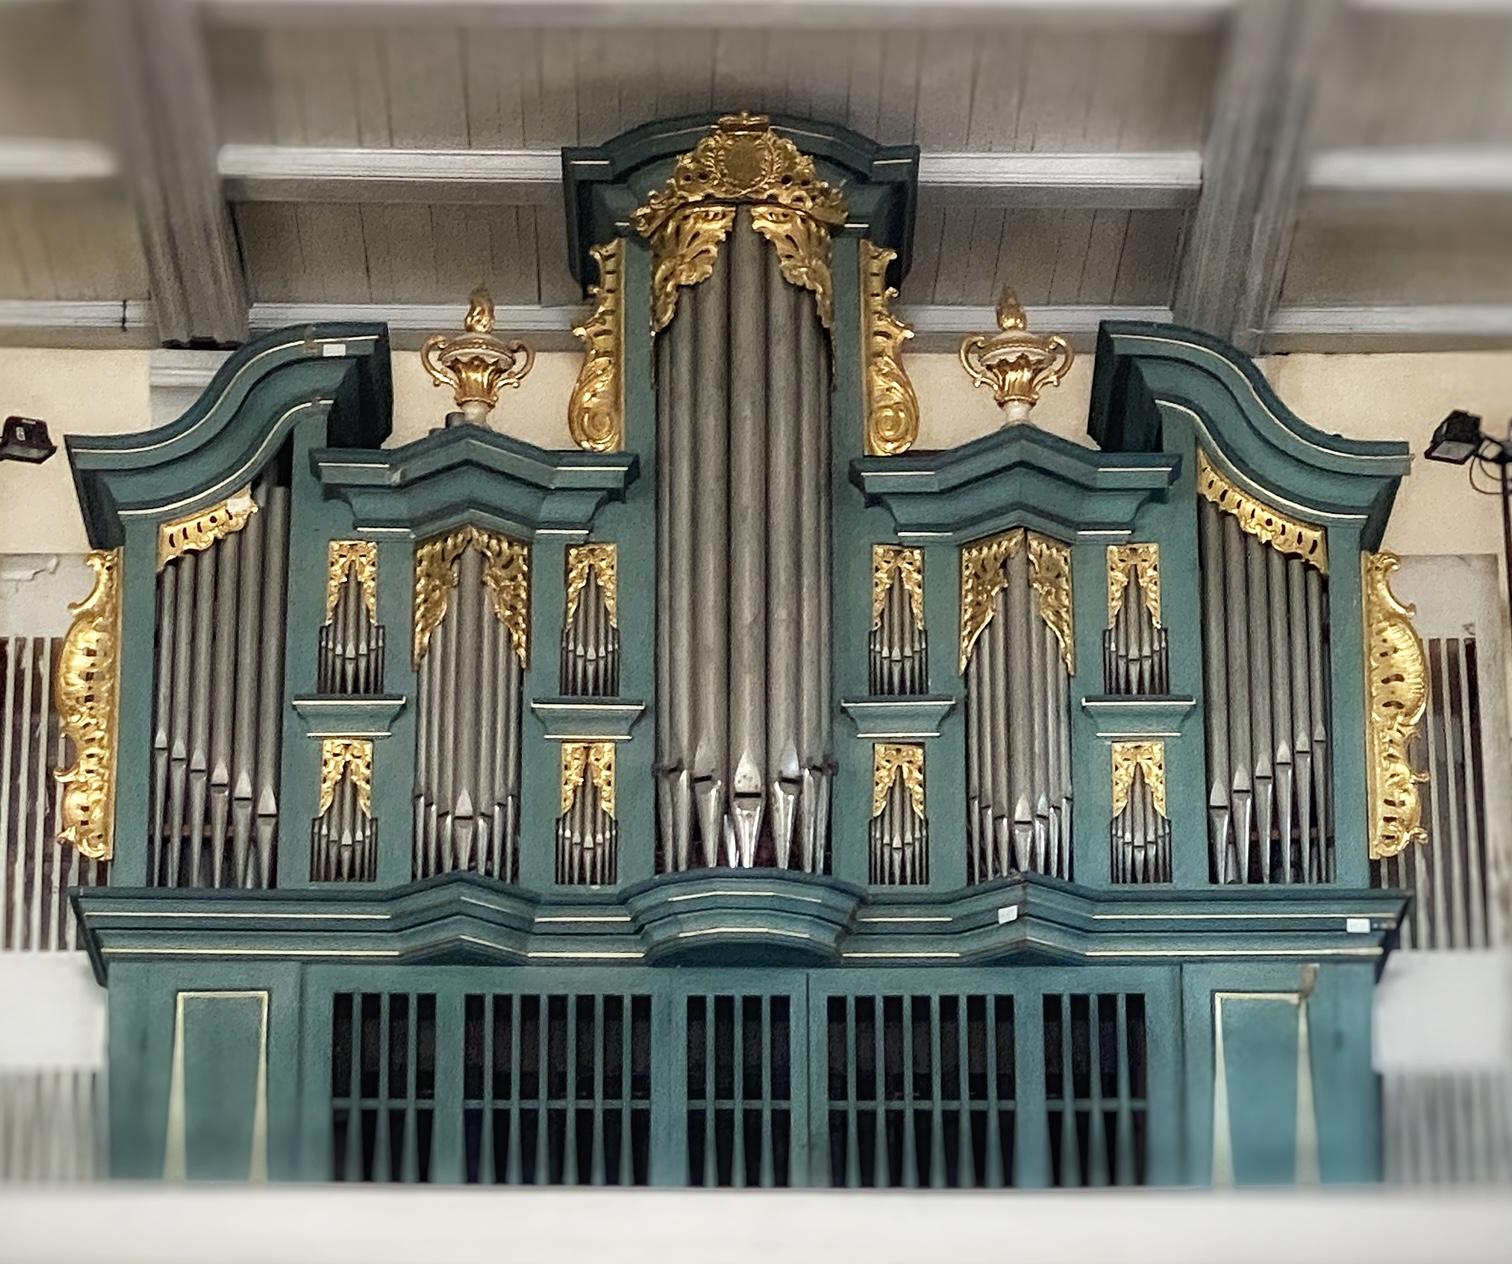 Orgeln in Kelkheim); ?>